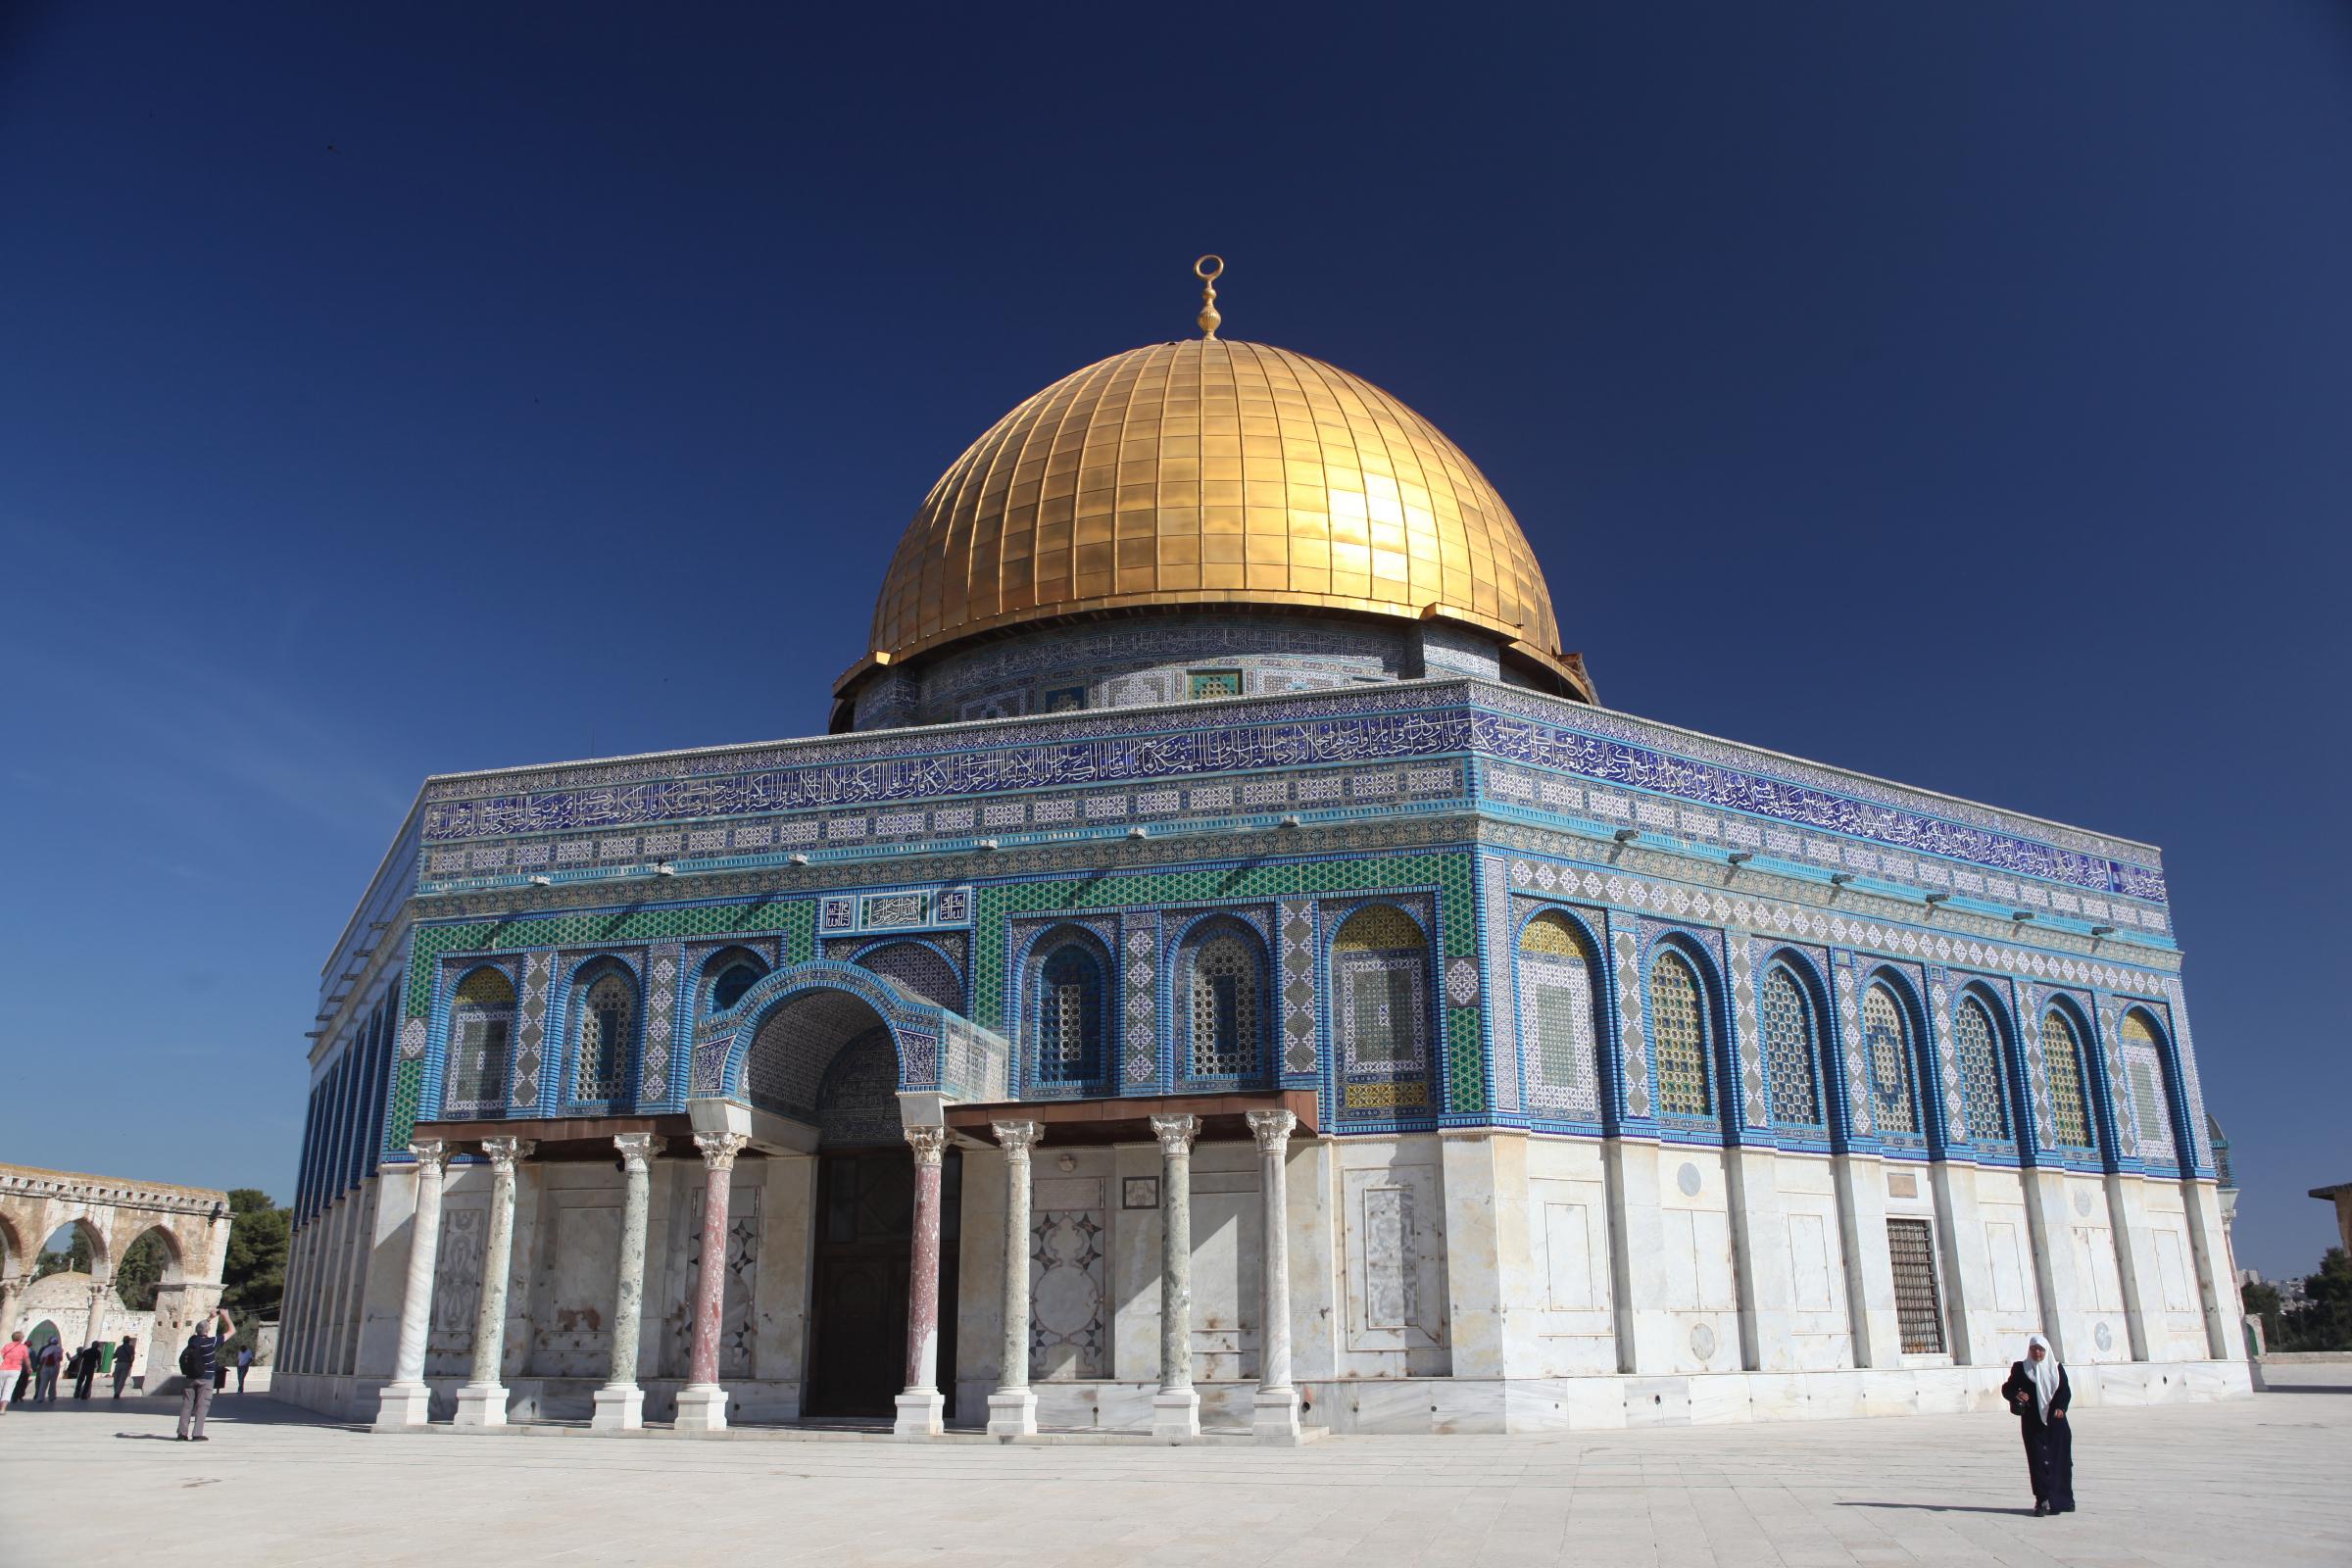 Free Download Dome Of The Rock Jerusalem 789122 Wallpaperjpg